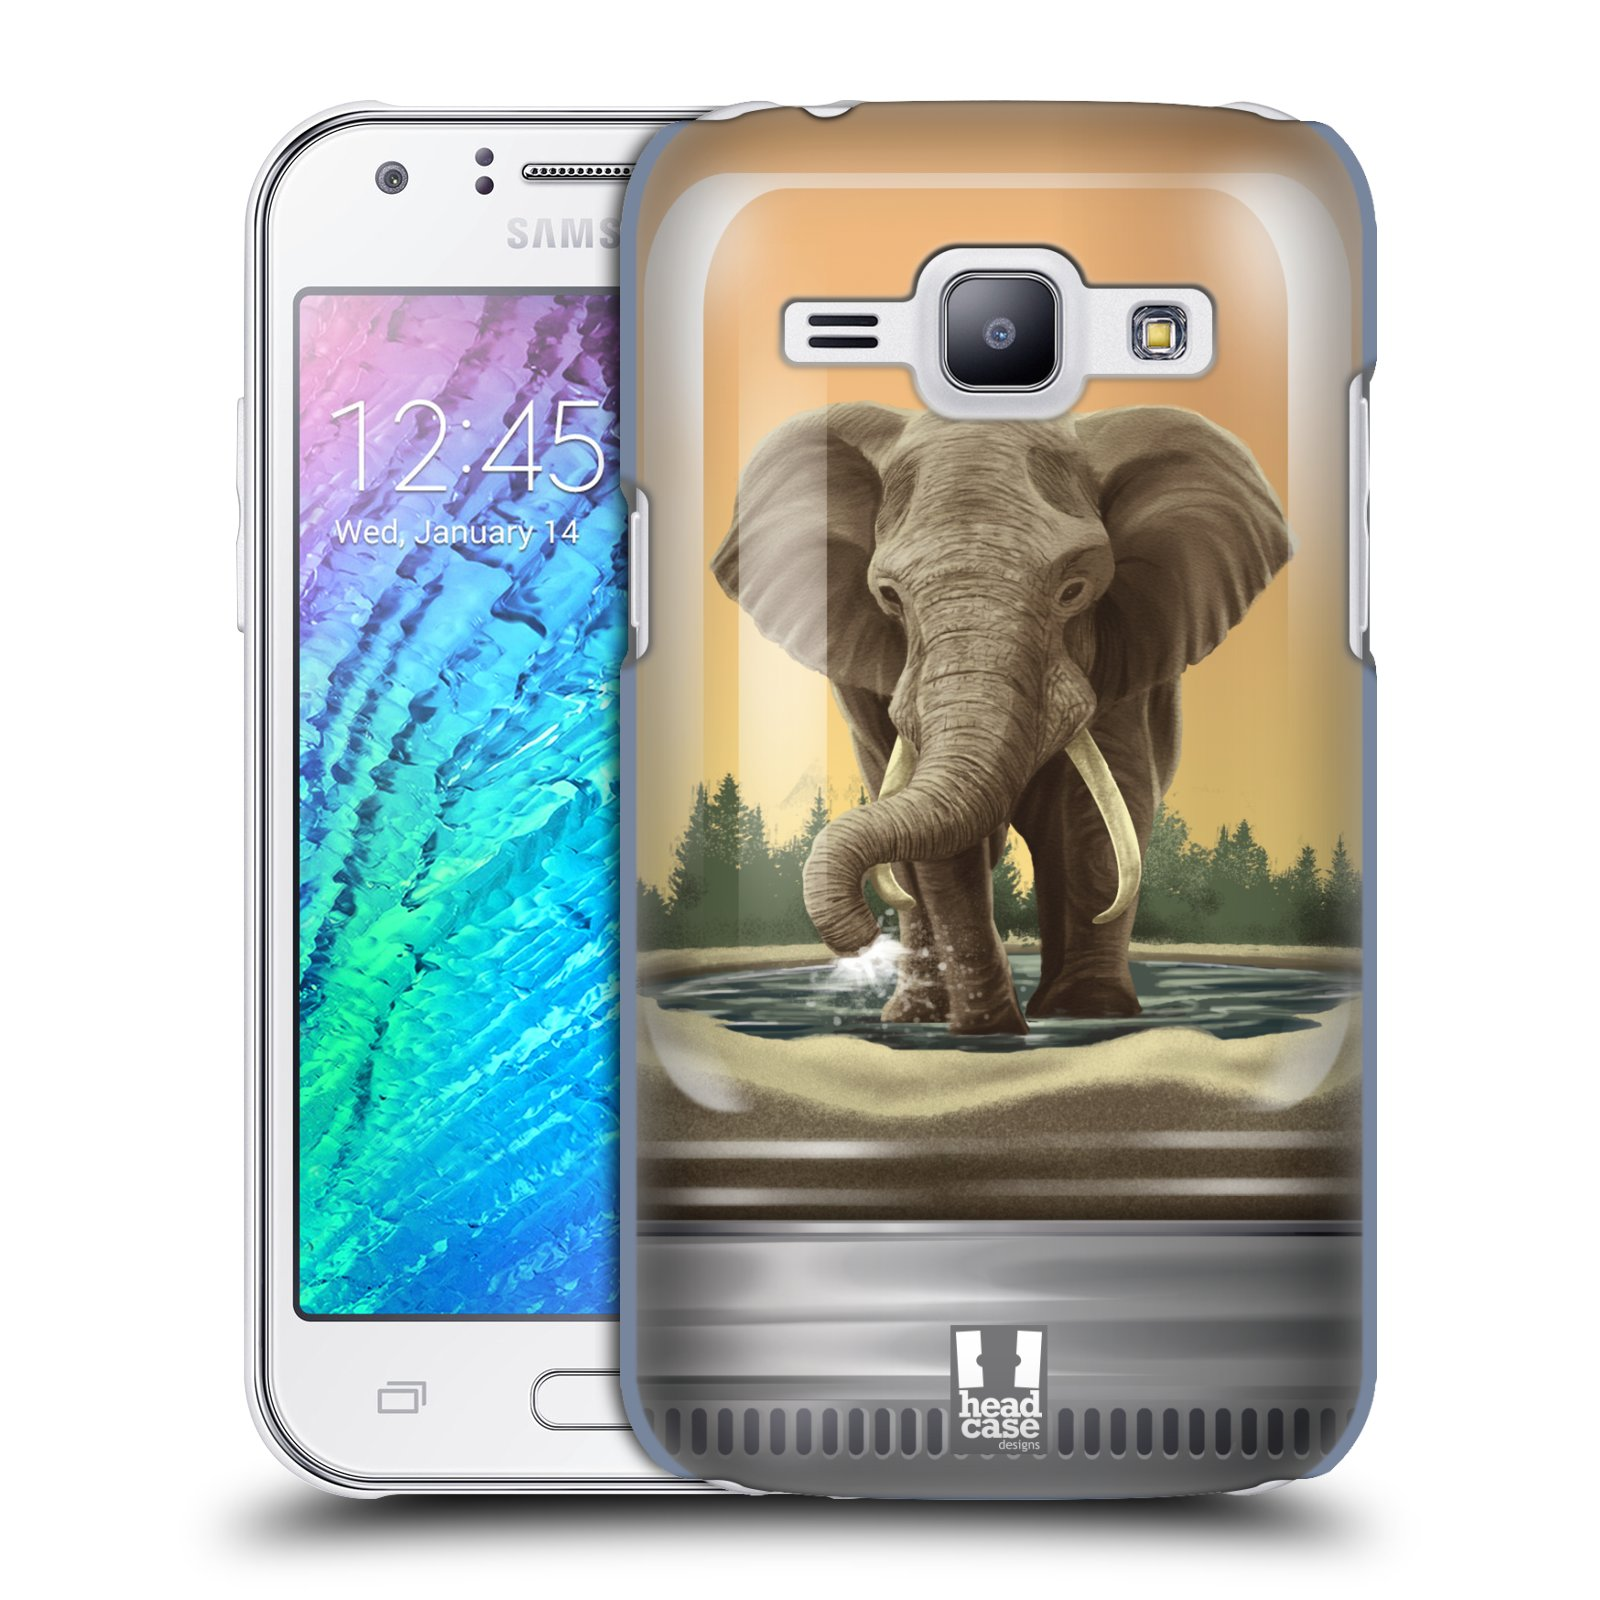 HEAD CASE plastový obal na mobil SAMSUNG Galaxy J1, J100 vzor Zvířátka v těžítku slon